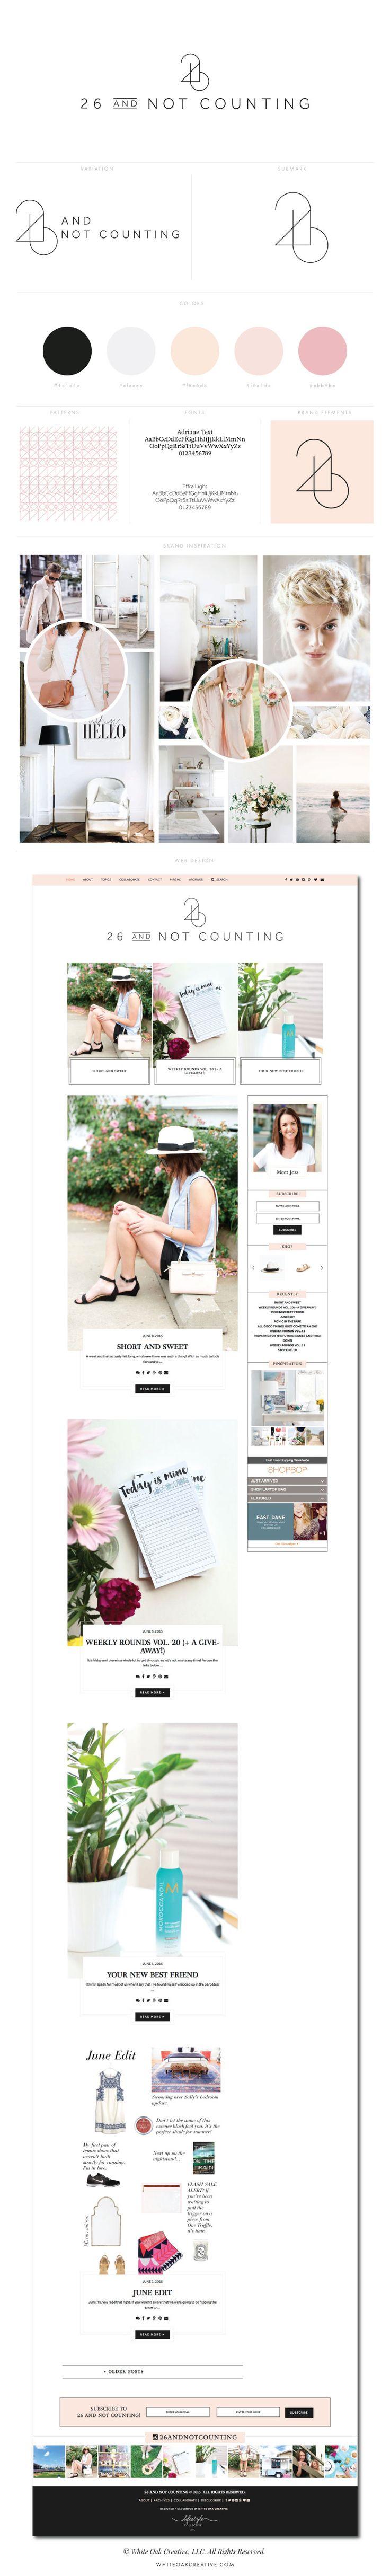 Enjoyable 17 Best Ideas About Web Design On Pinterest Website Website Largest Home Design Picture Inspirations Pitcheantrous